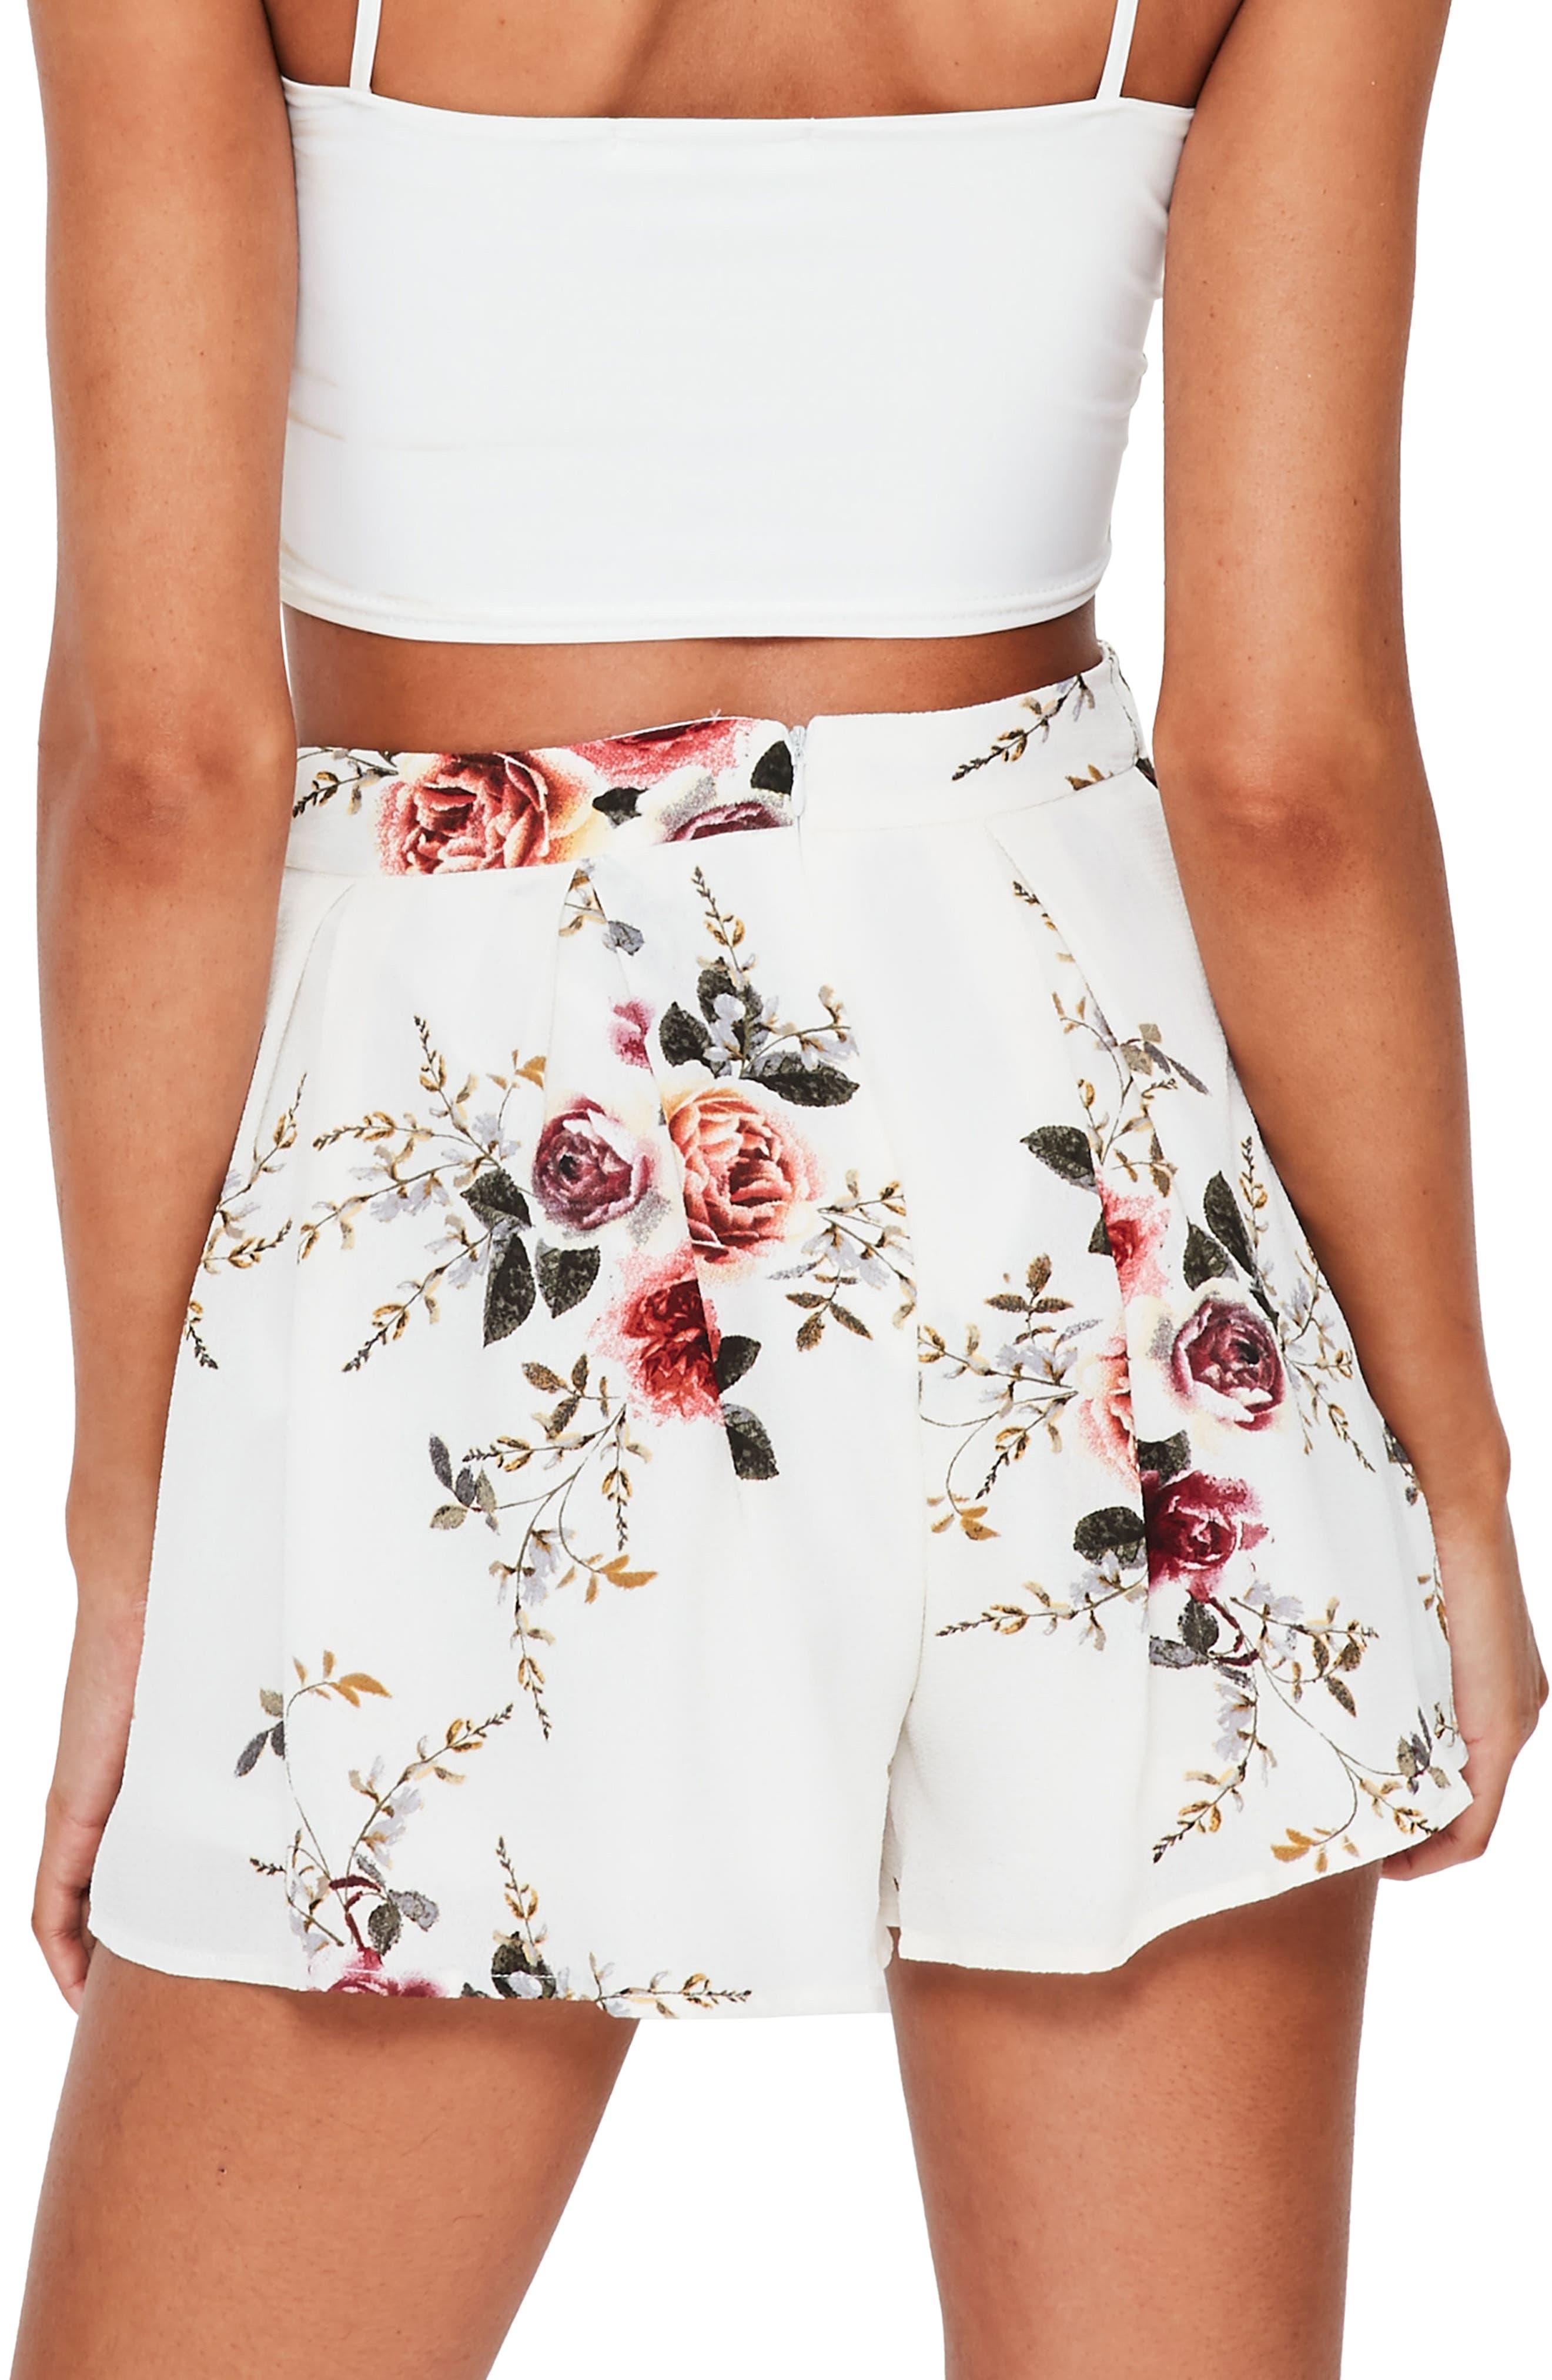 Floral Print High Waist Shorts,                             Alternate thumbnail 2, color,                             903